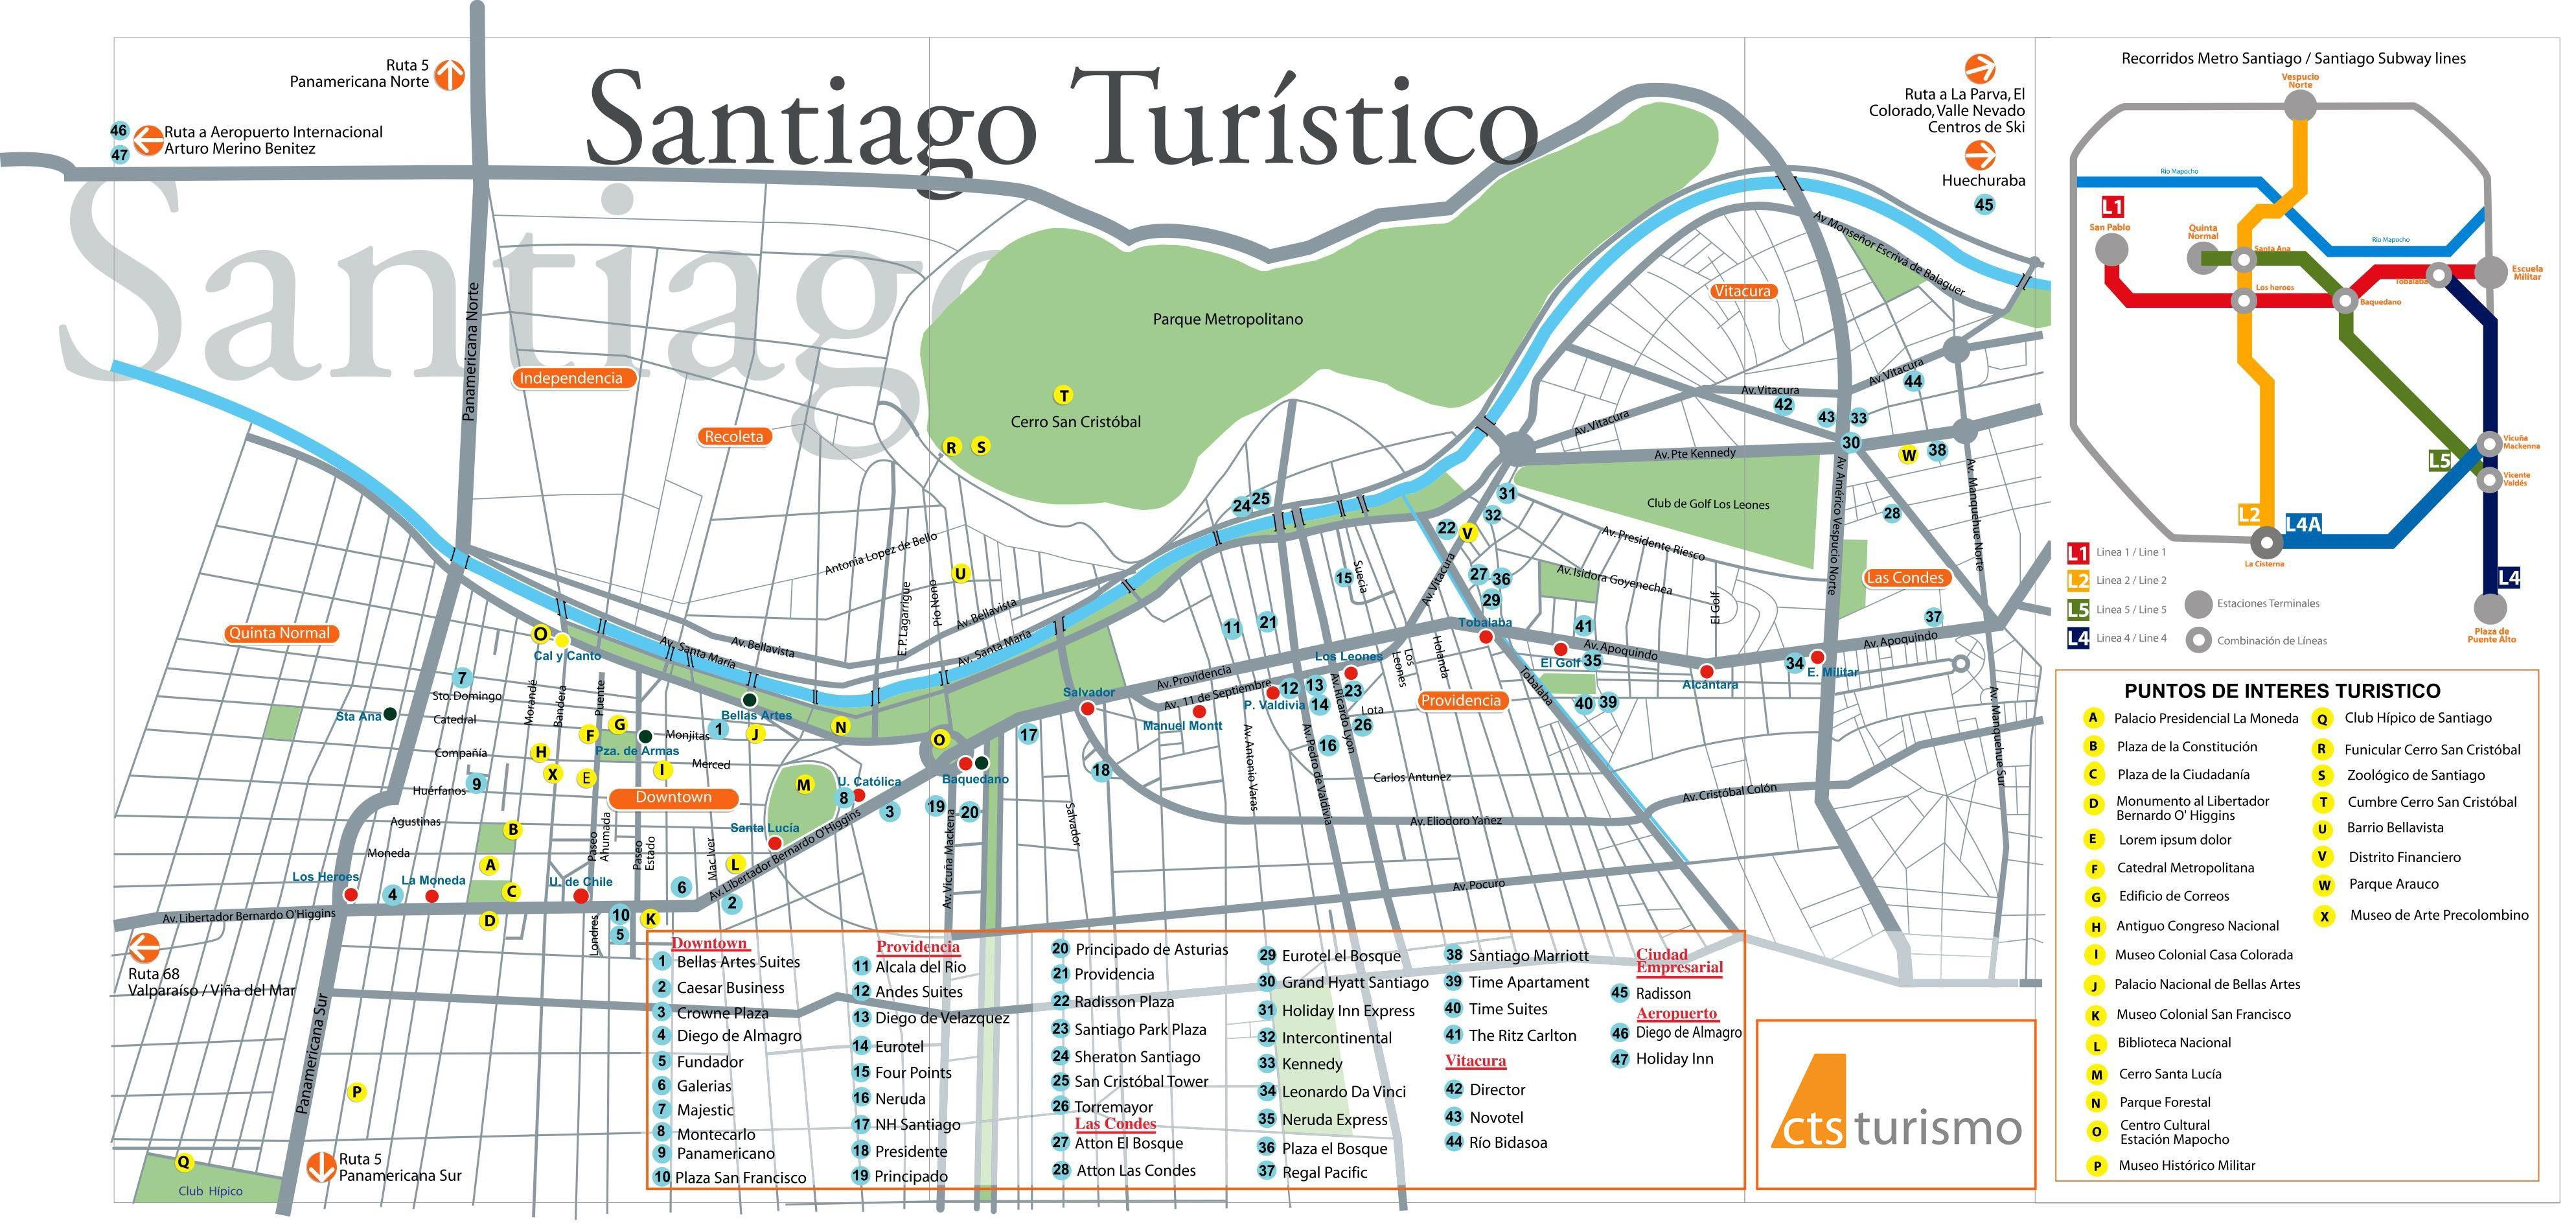 Santiago De Chile Mapa Turistico.Mapa Turistico De Santiago In 2019 Chile Santiago Map